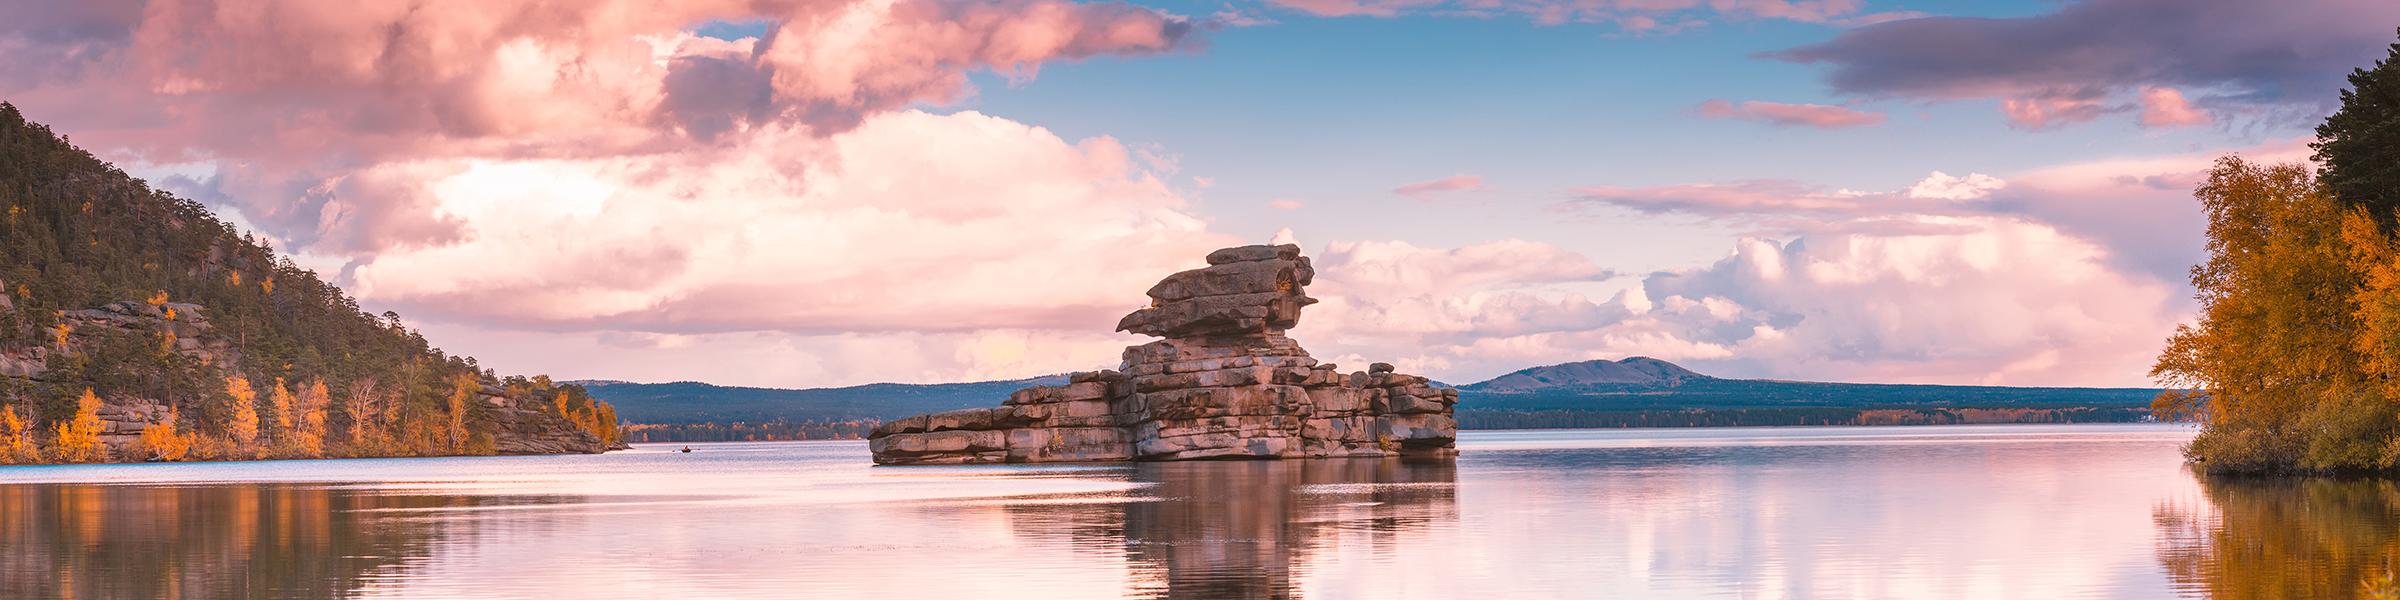 Borovoe Lake, Burabay National Park, Kazakhstan